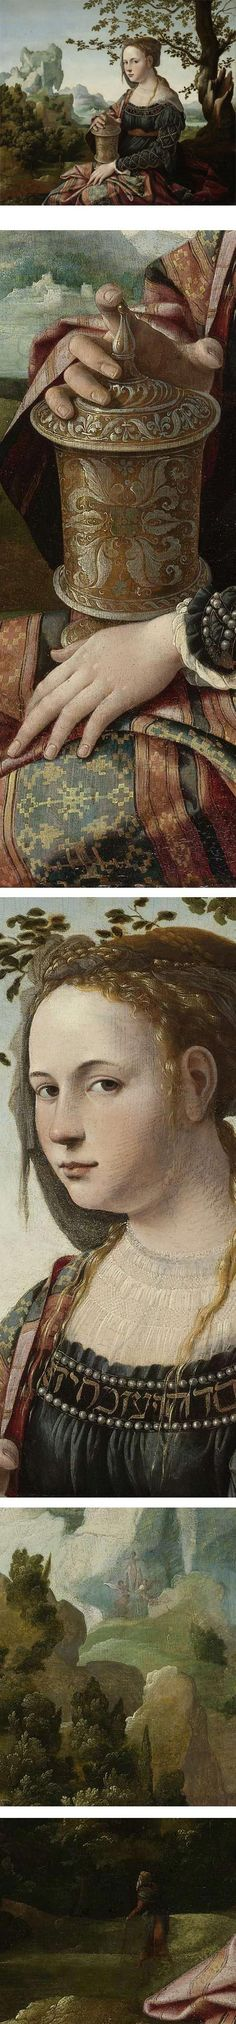 Pocket : Eye Candy for Today: Jan van Scorel's Maria Magdalena